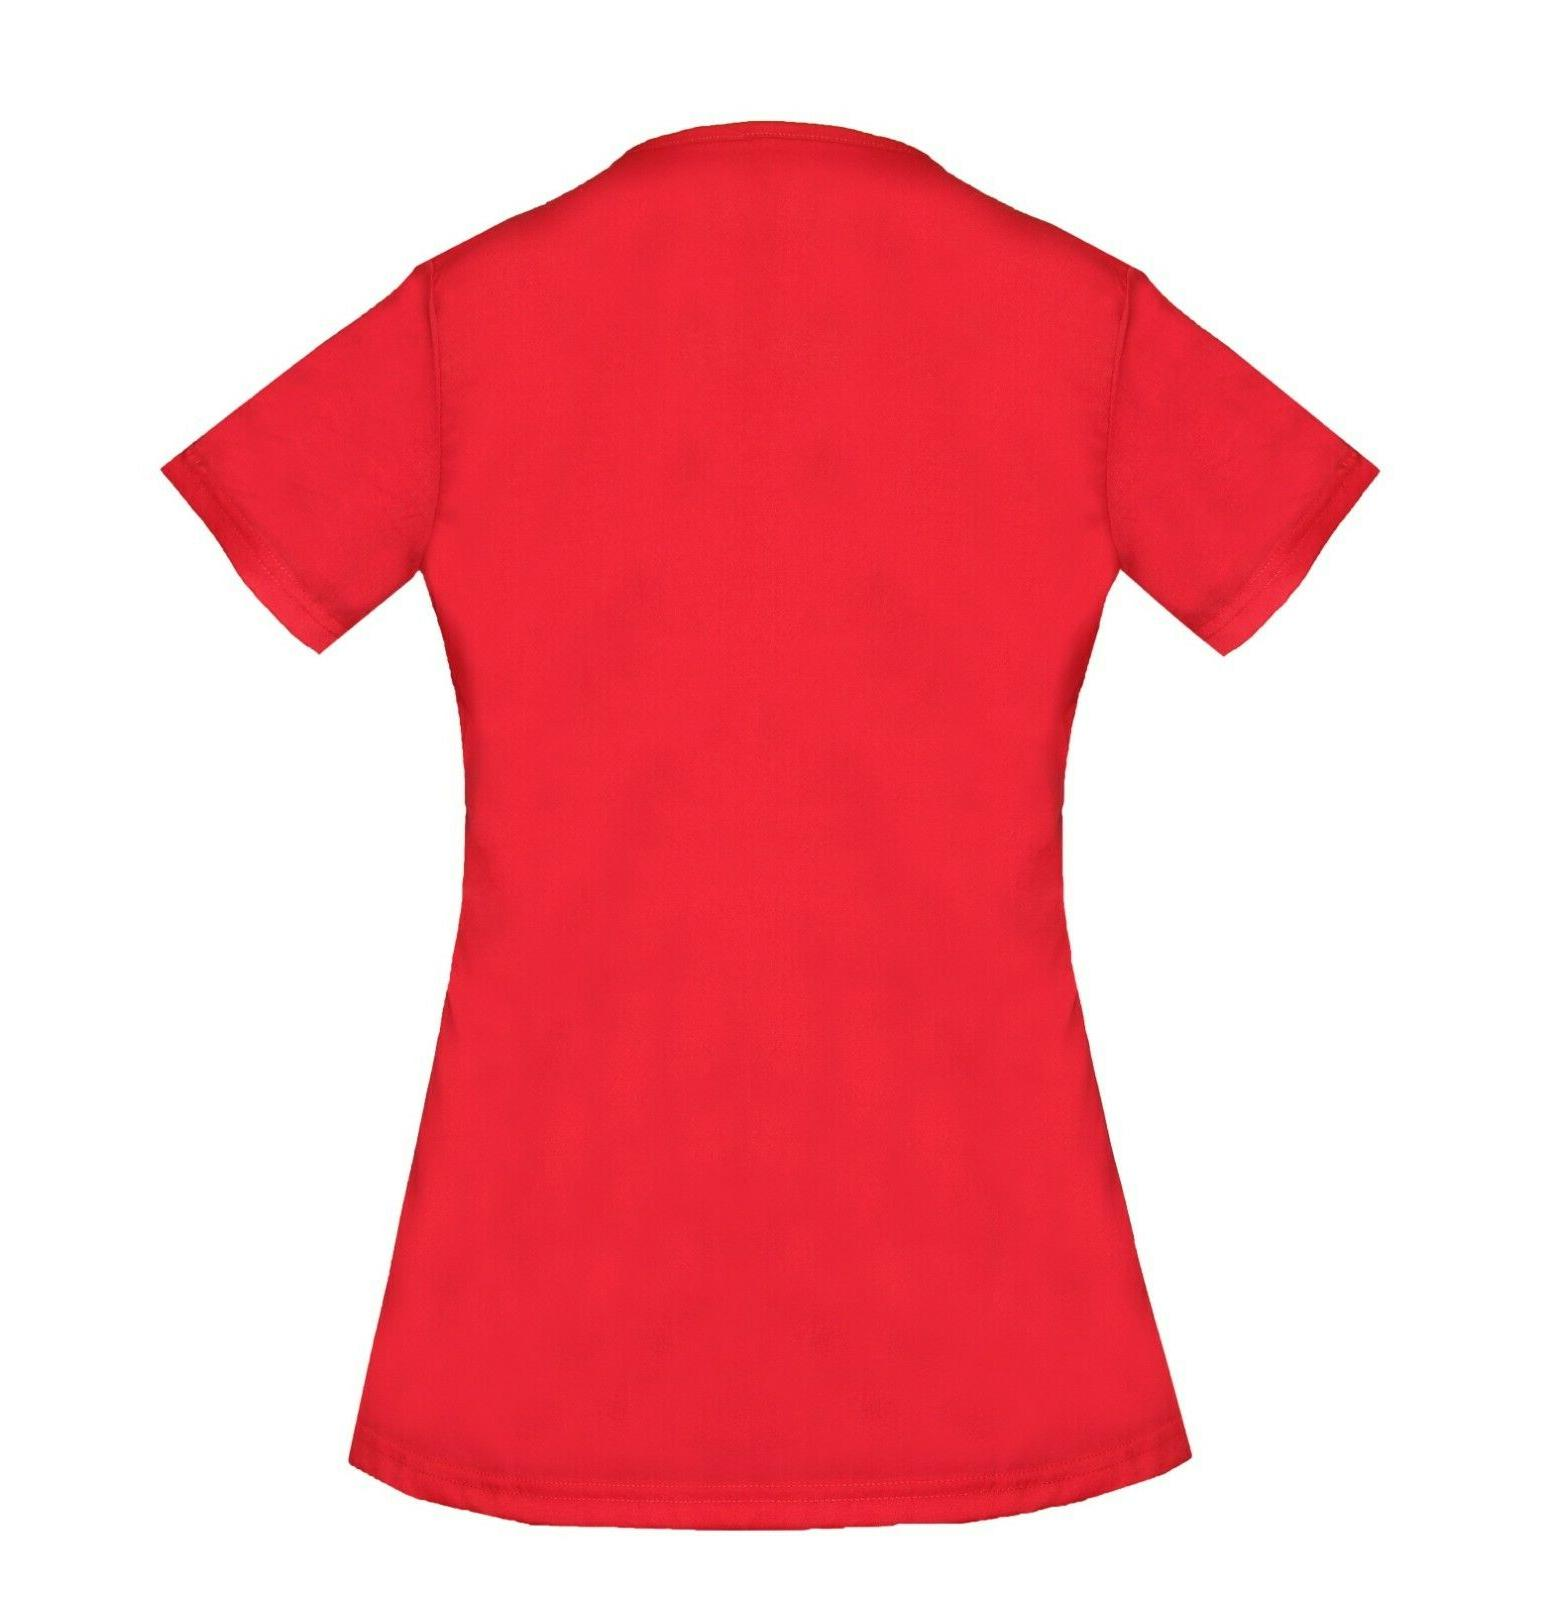 Womens Nursing Uniform Top M L